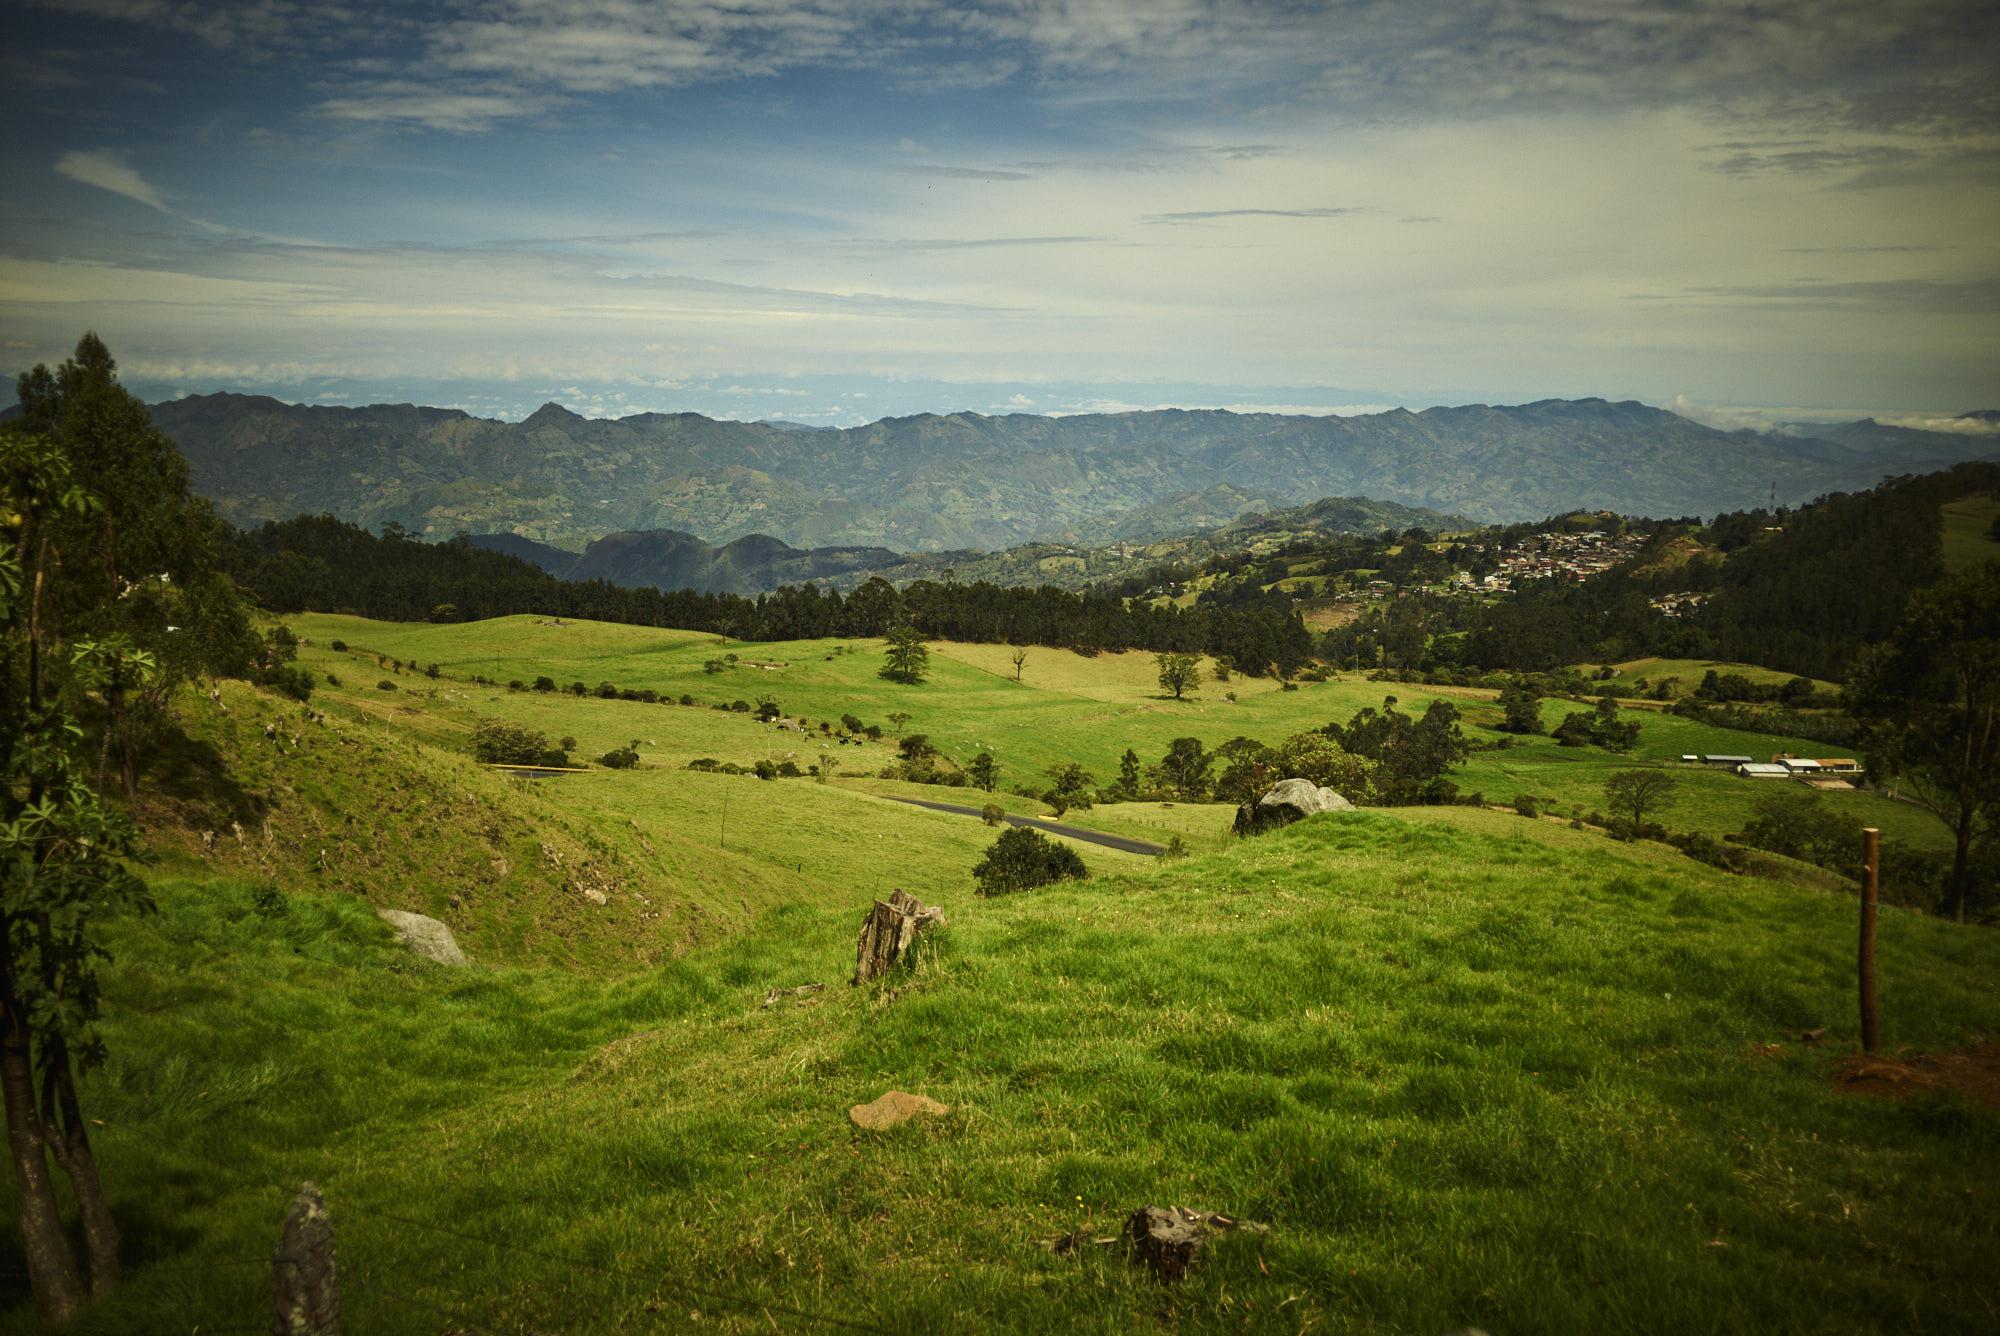 LOWRES-RADRACE-COLUMBIA-2018-CARLOS-1291.jpg